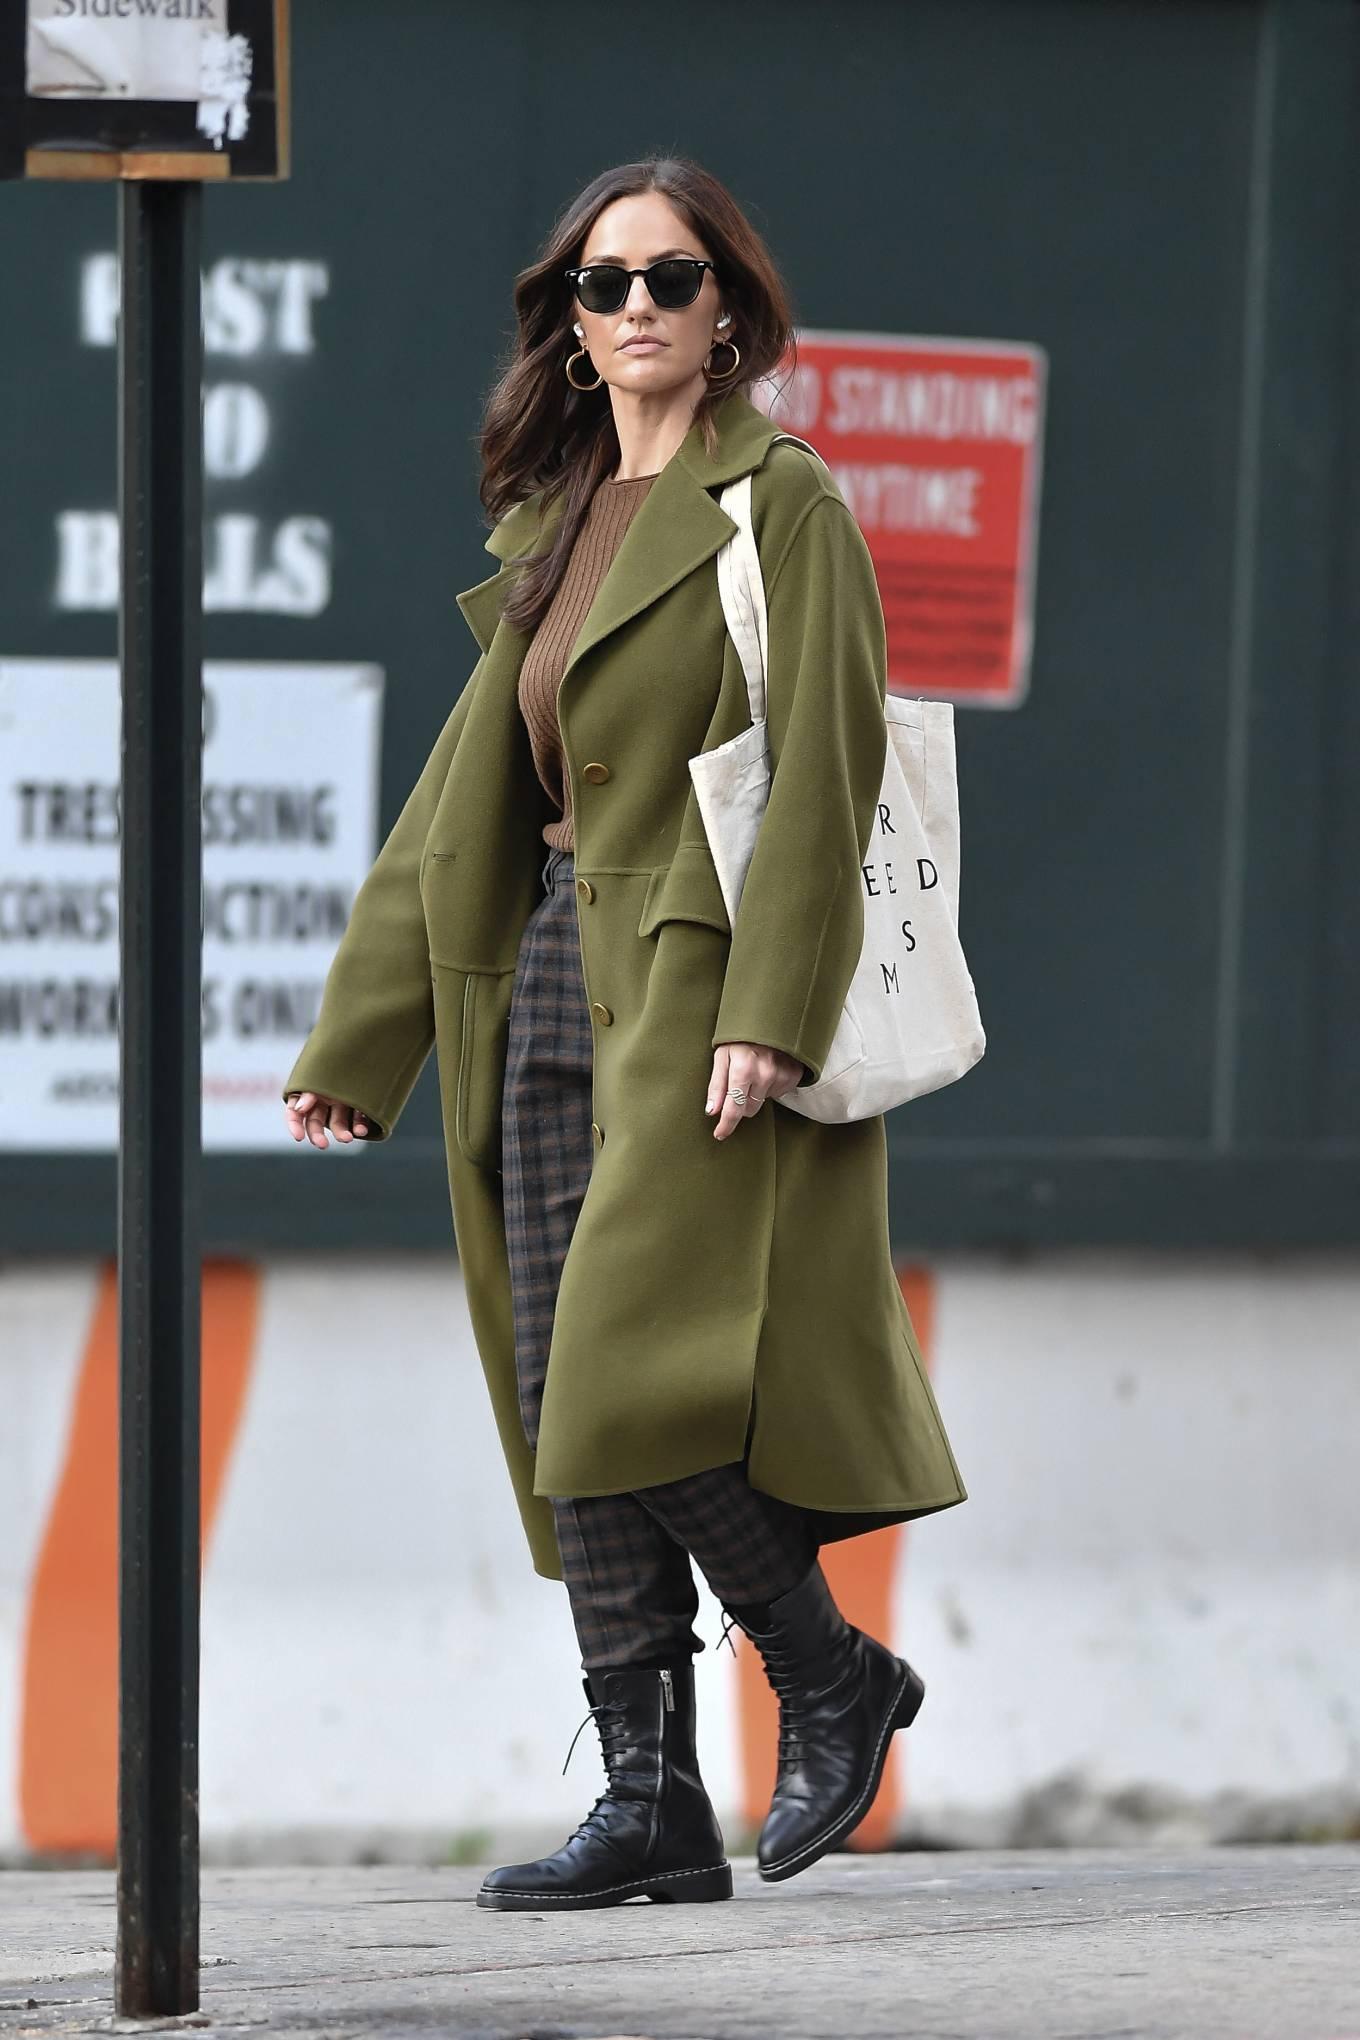 Minka Kelly 2021 : Minka Kelly – In olive green runs errands in New York-05